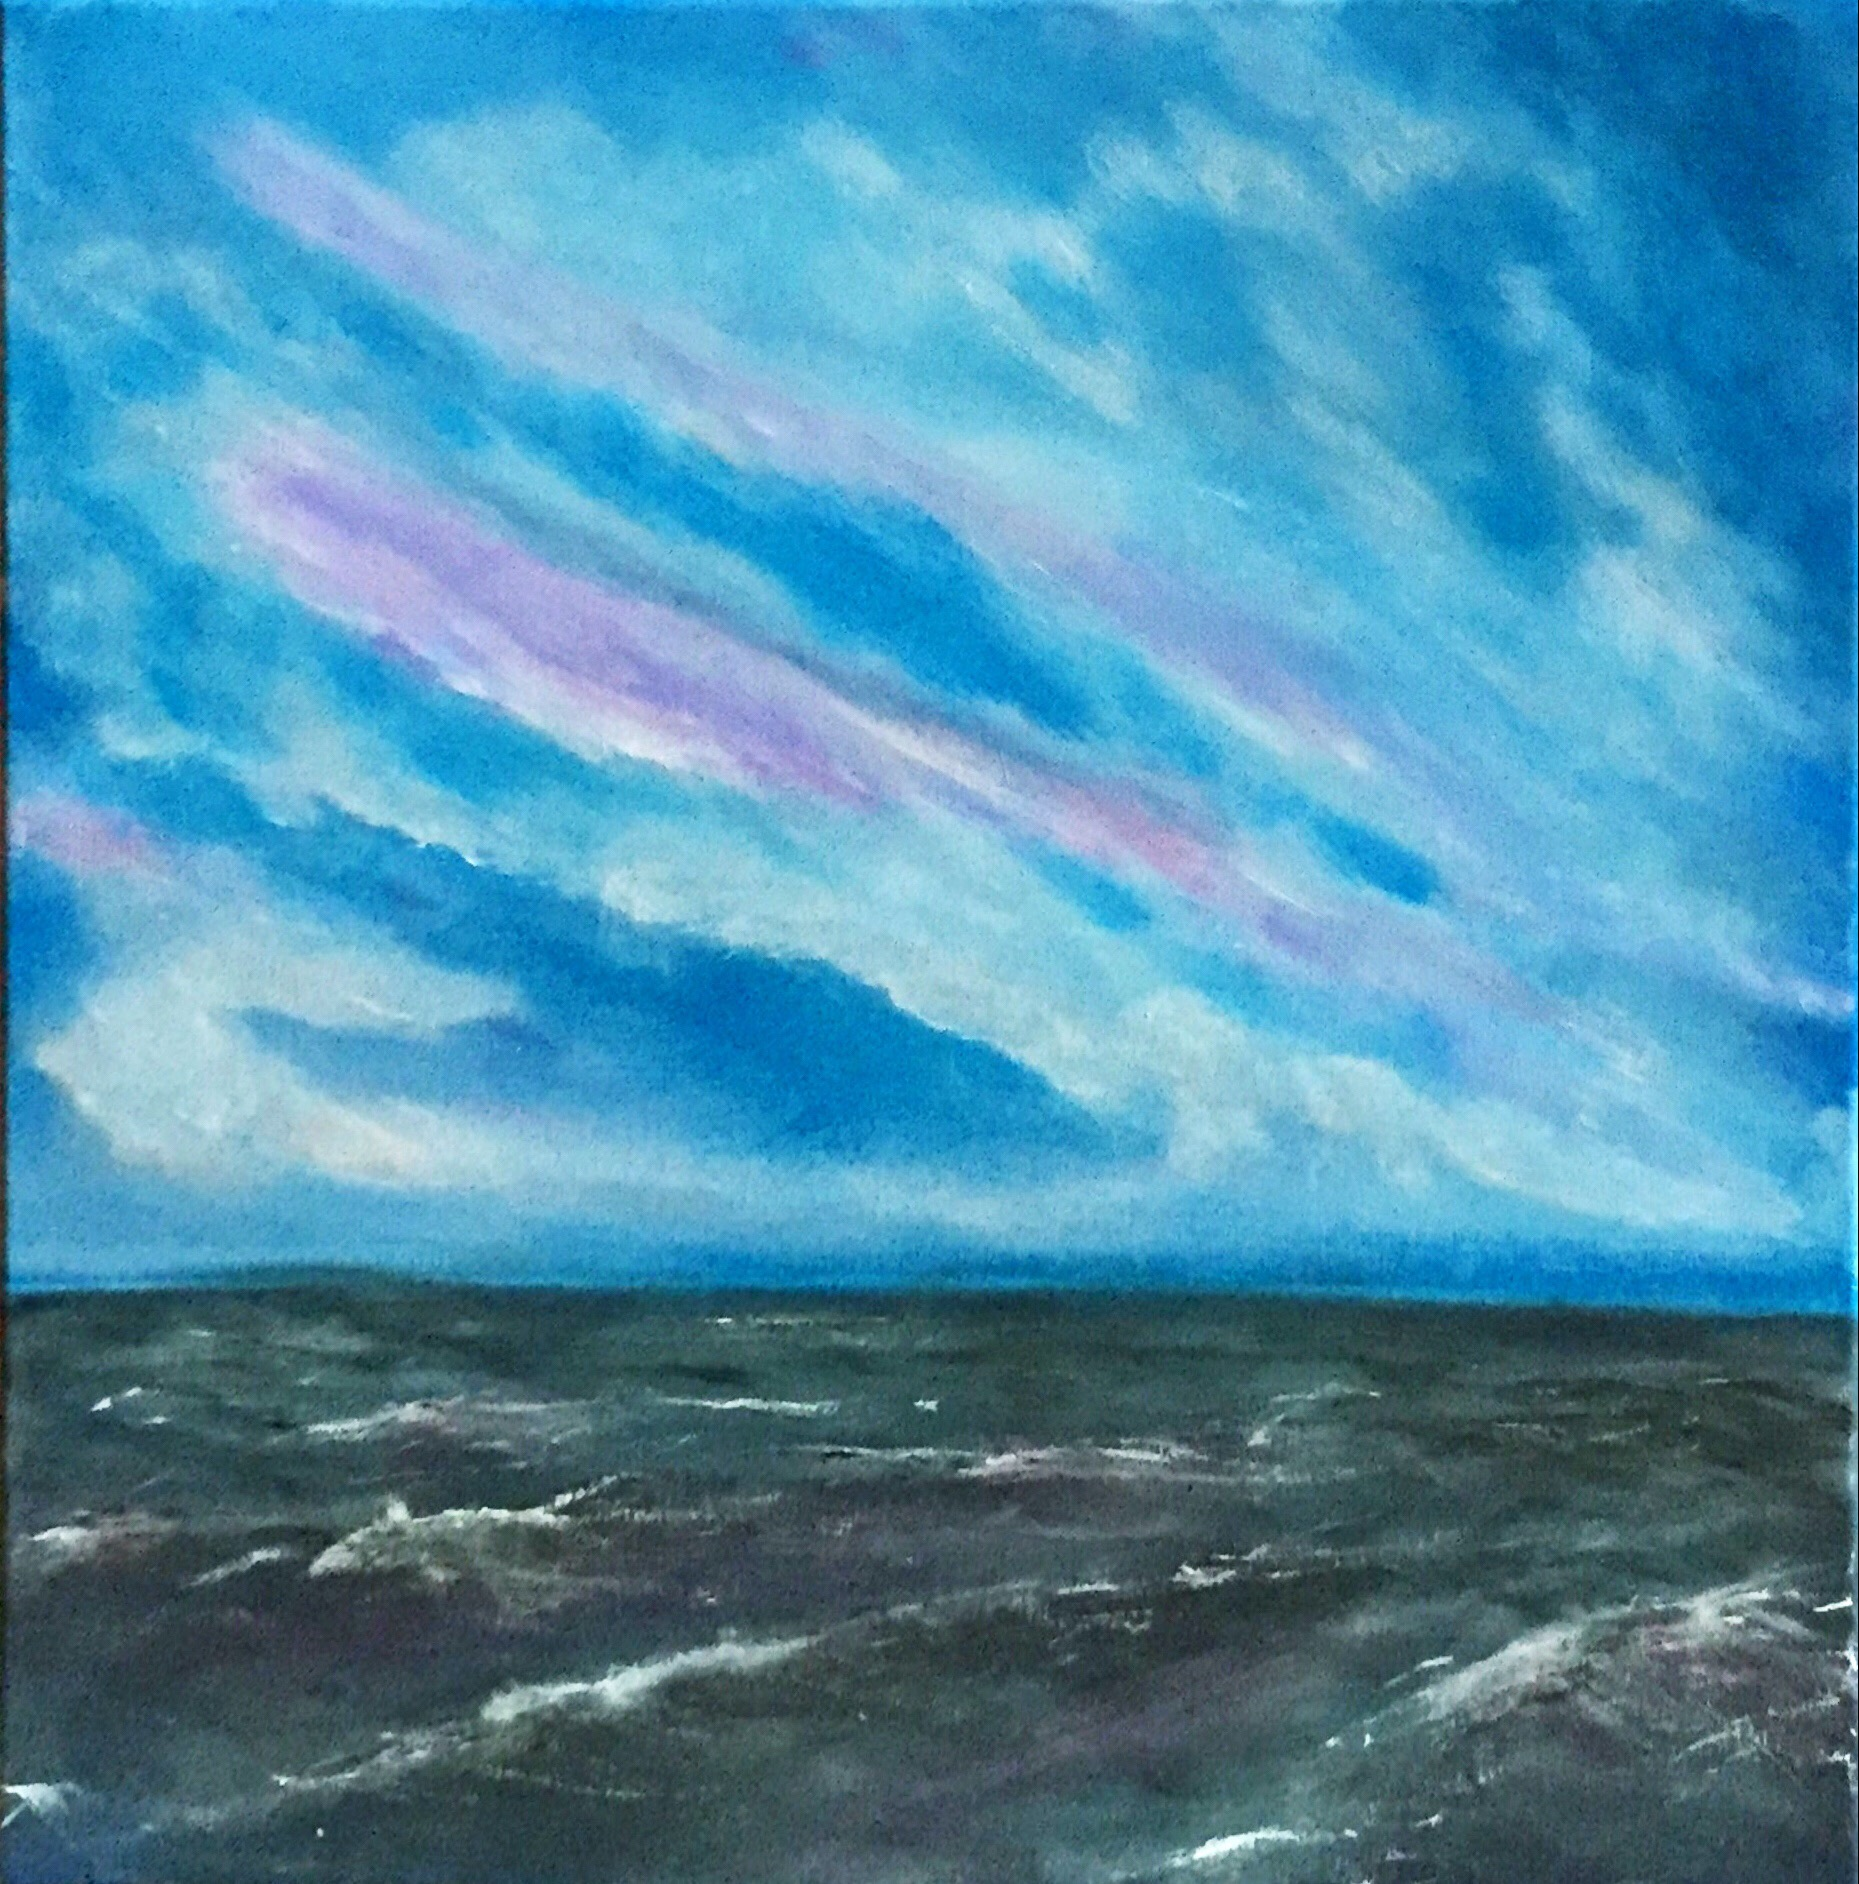 SoulArtist Michael Lubomirski Acrylmalerei Sonnenuntergang auf Leinwand